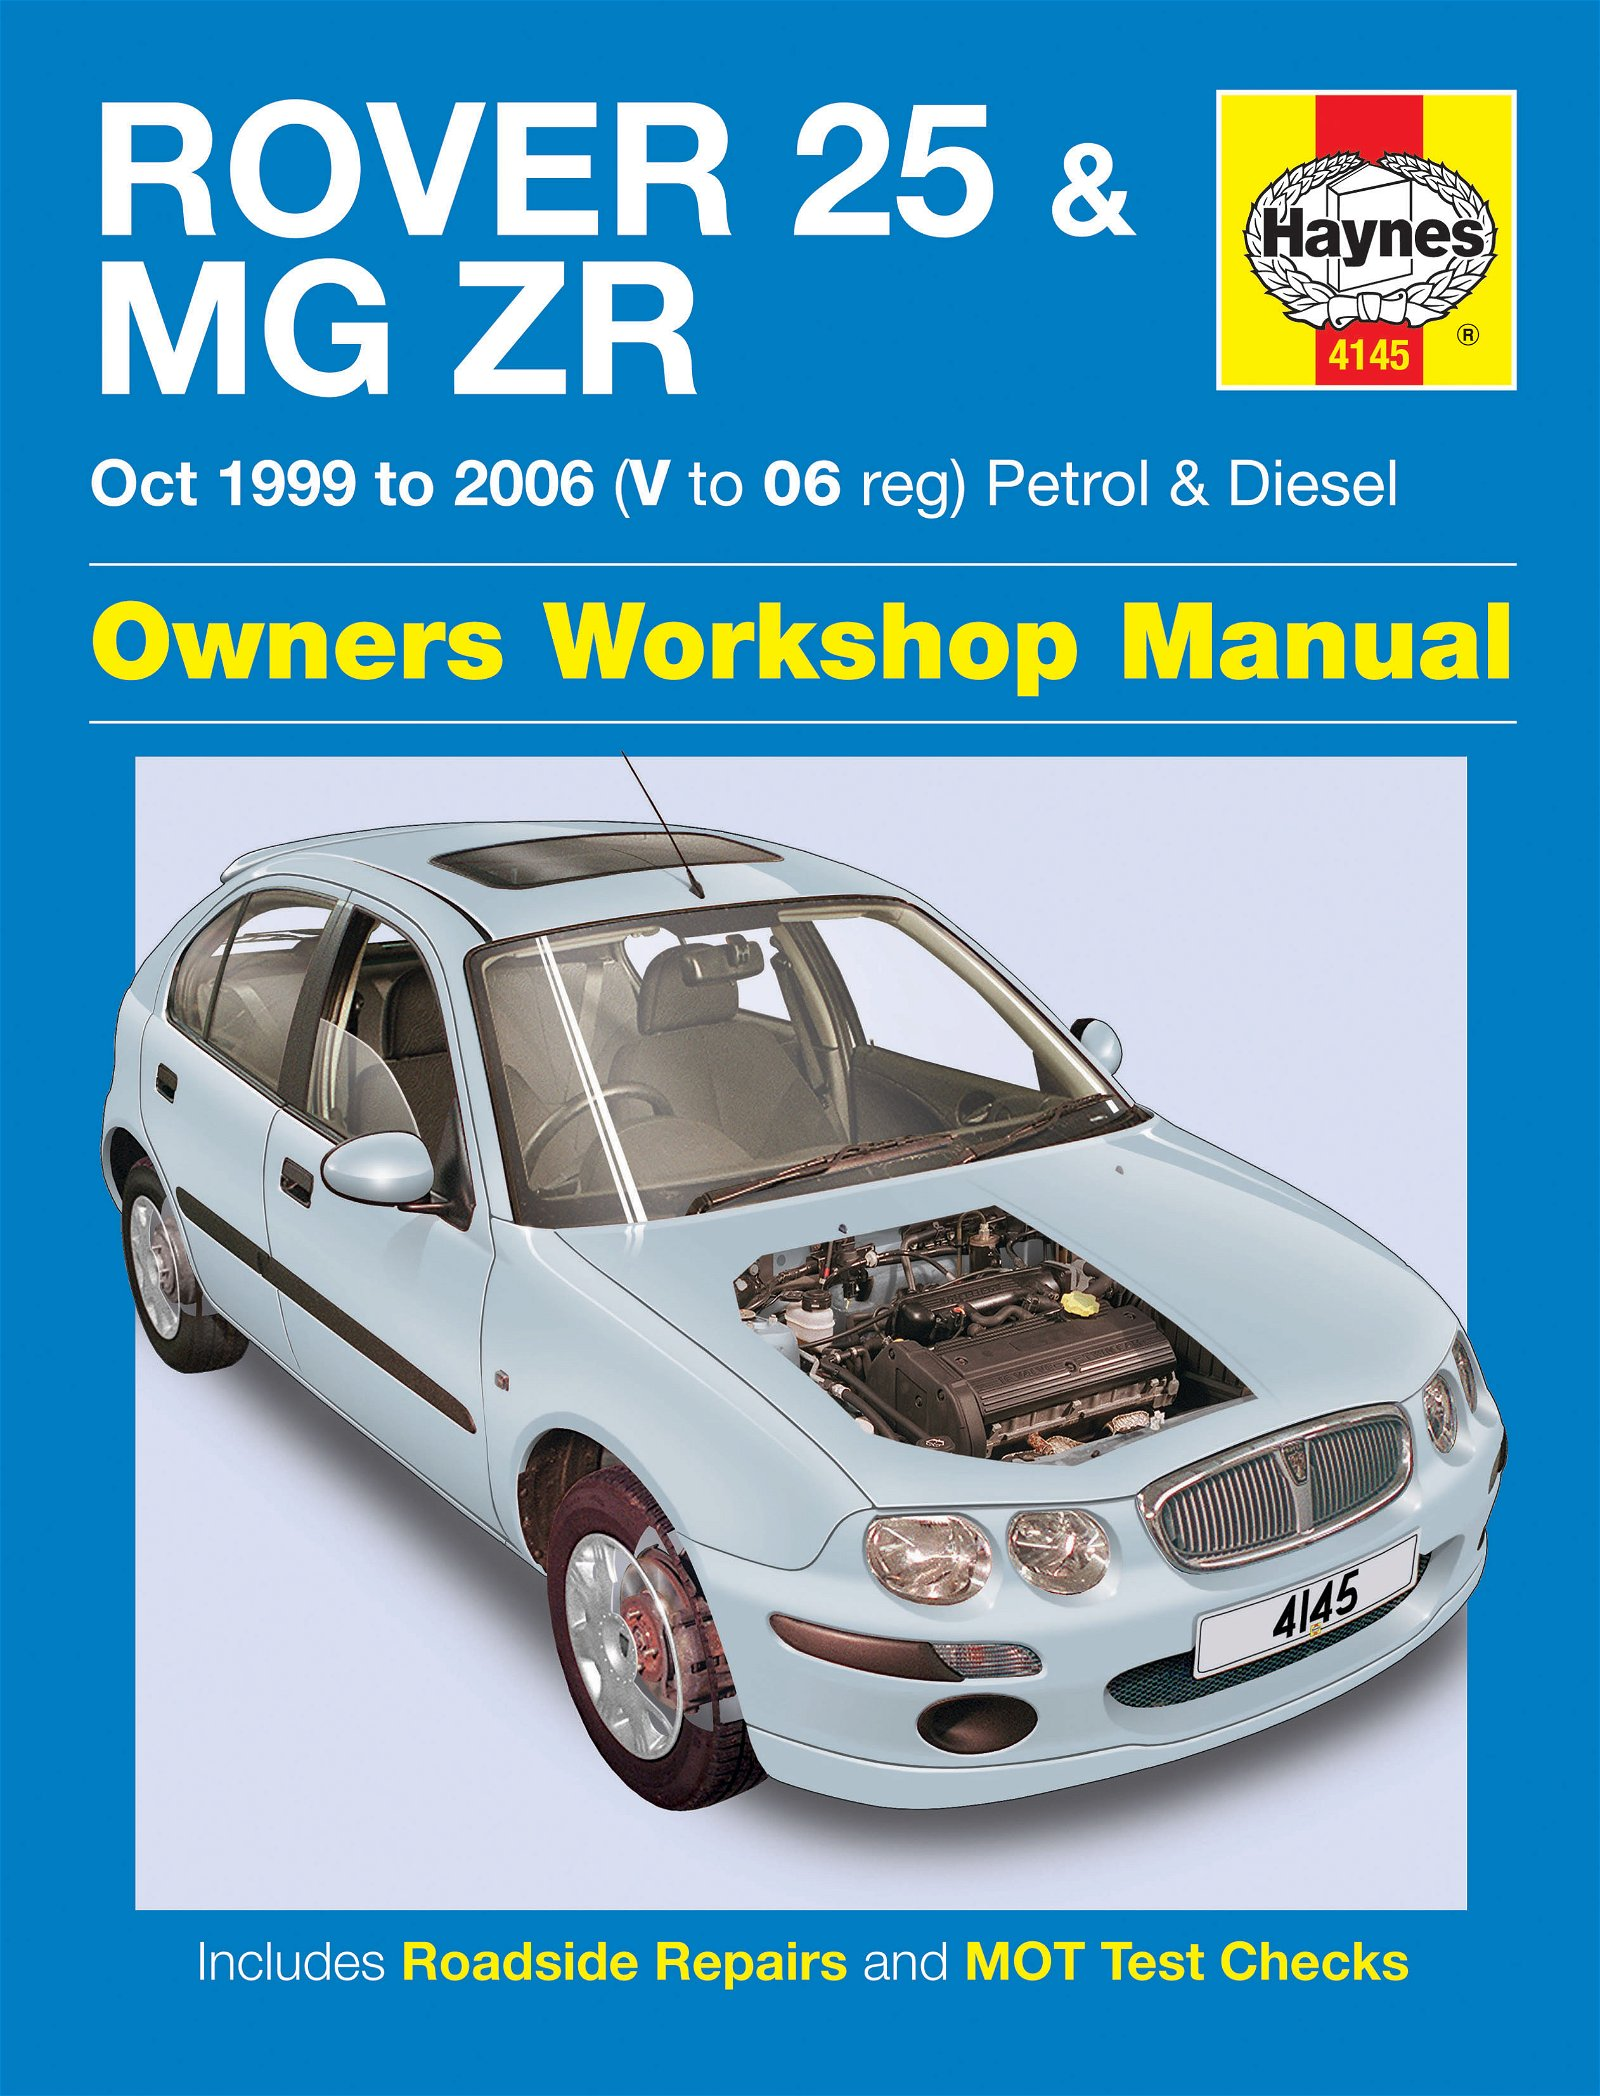 [Manuel UK en Anglais] Rover 25 & MG ZR Petrol & Diesel  (Oct 99 - 06)  V to 06